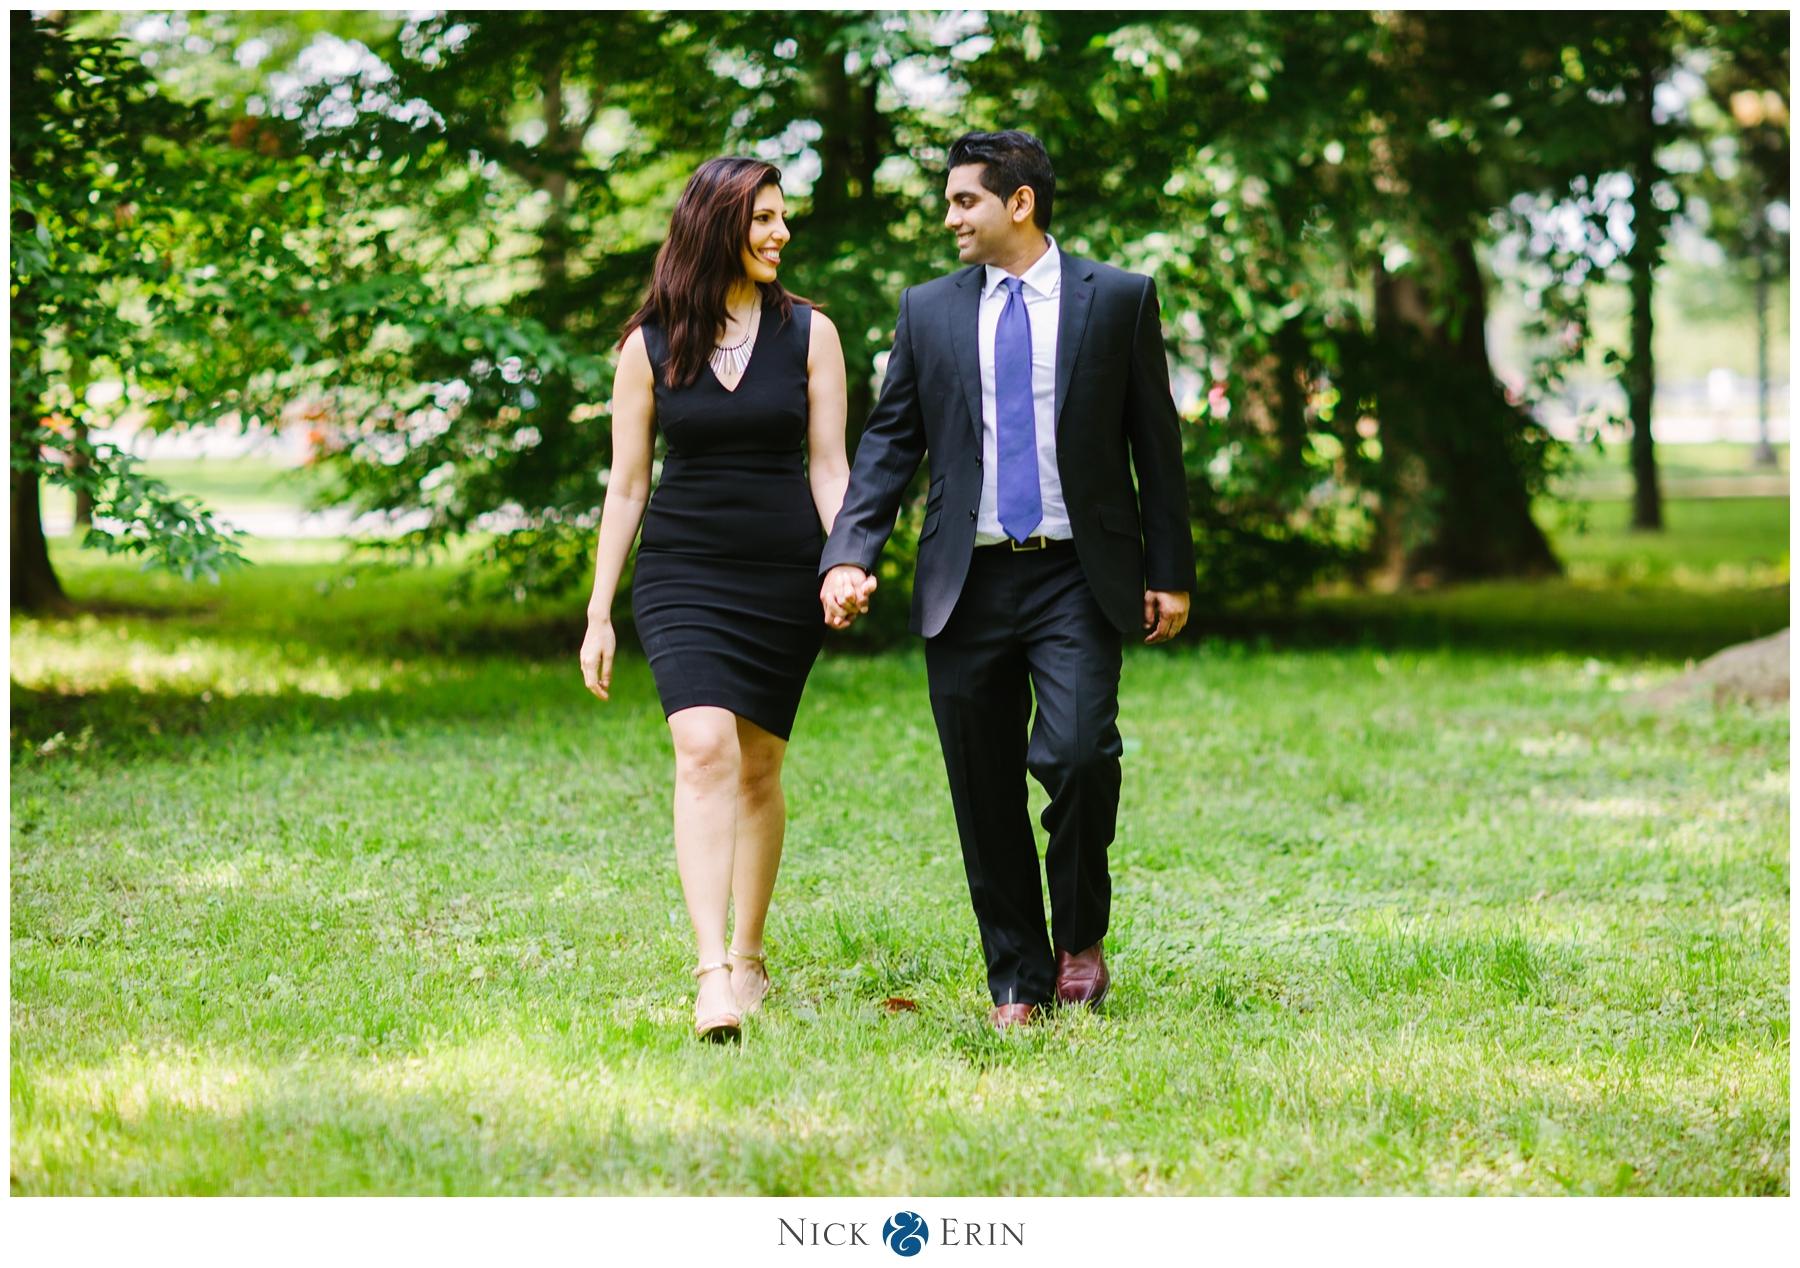 Donner_Photography_Washington DC Engagement_Bharti & Anadi_0002